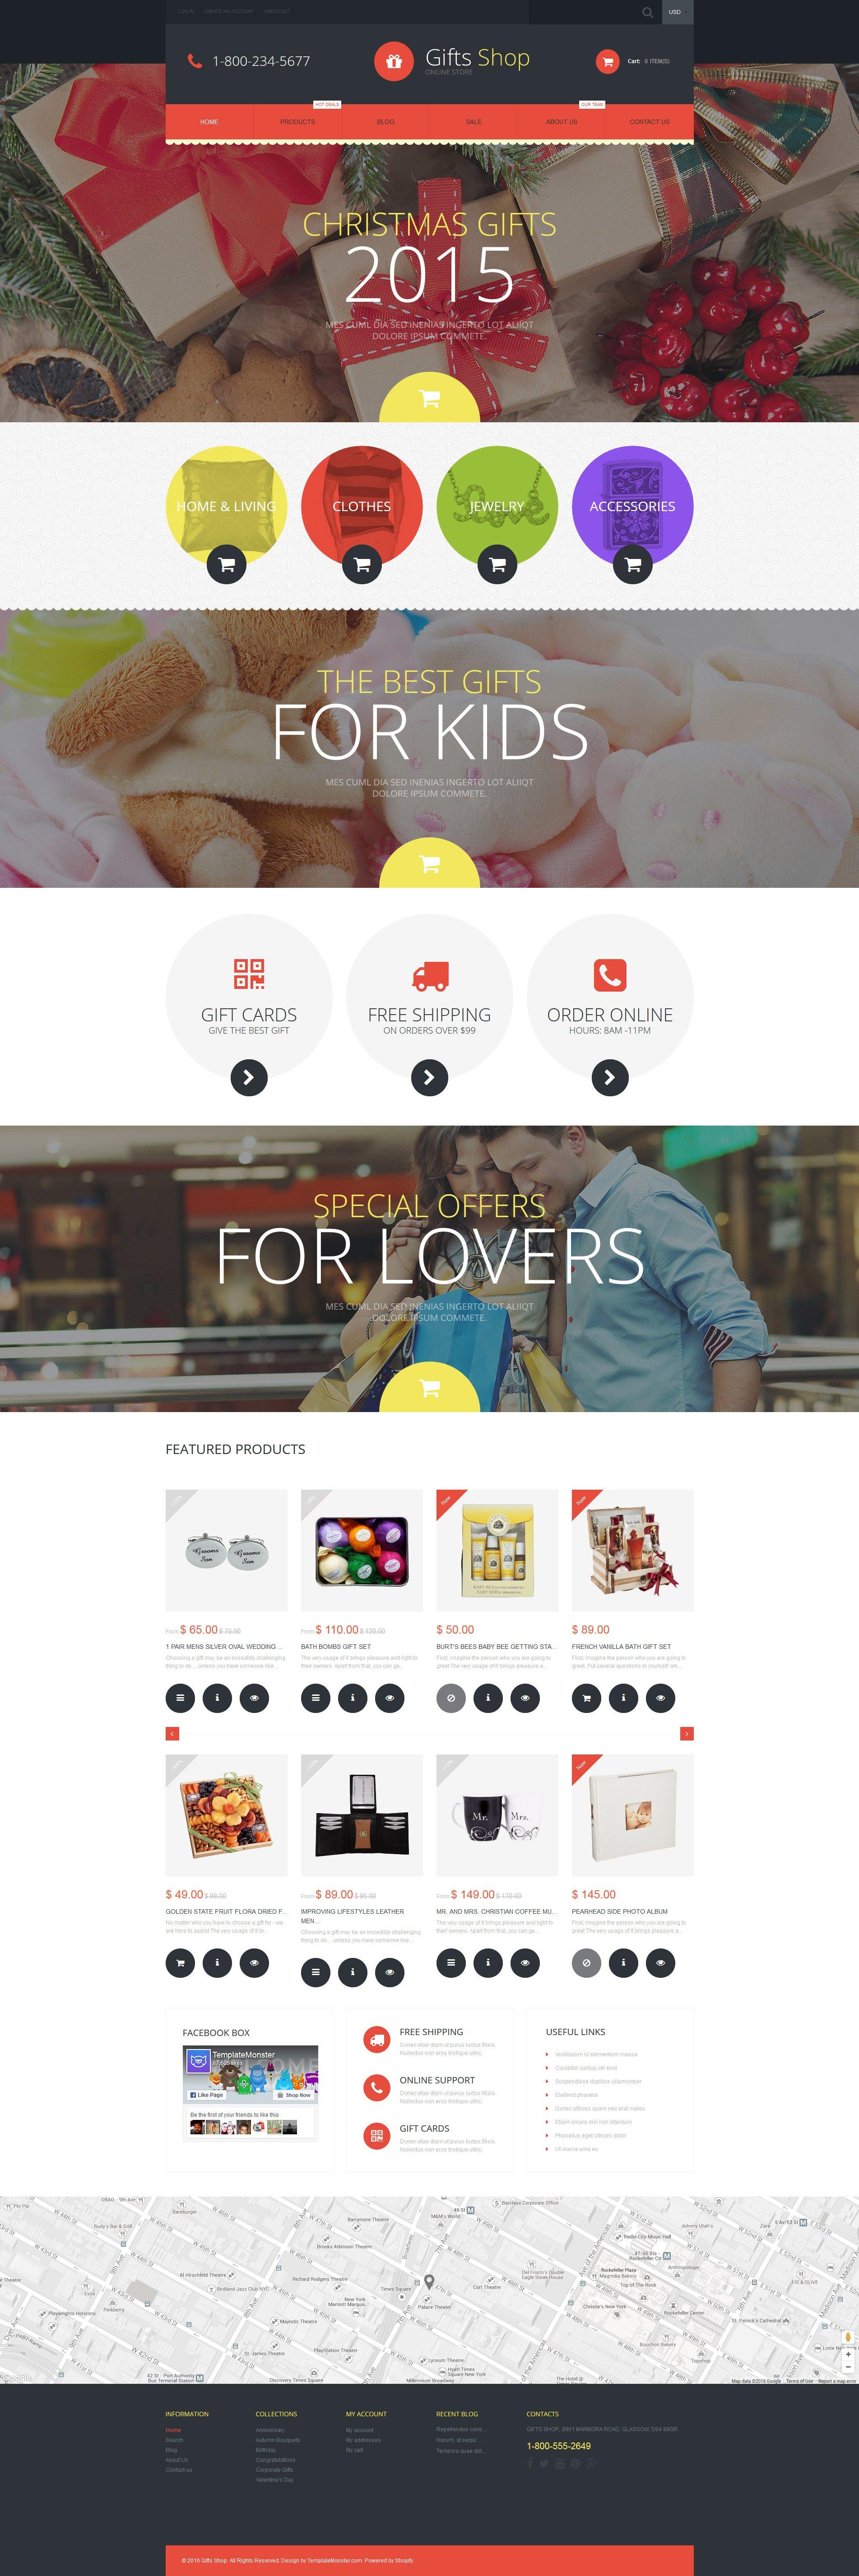 """Gifts Shop"" - адаптивний Shopify шаблон №55607"